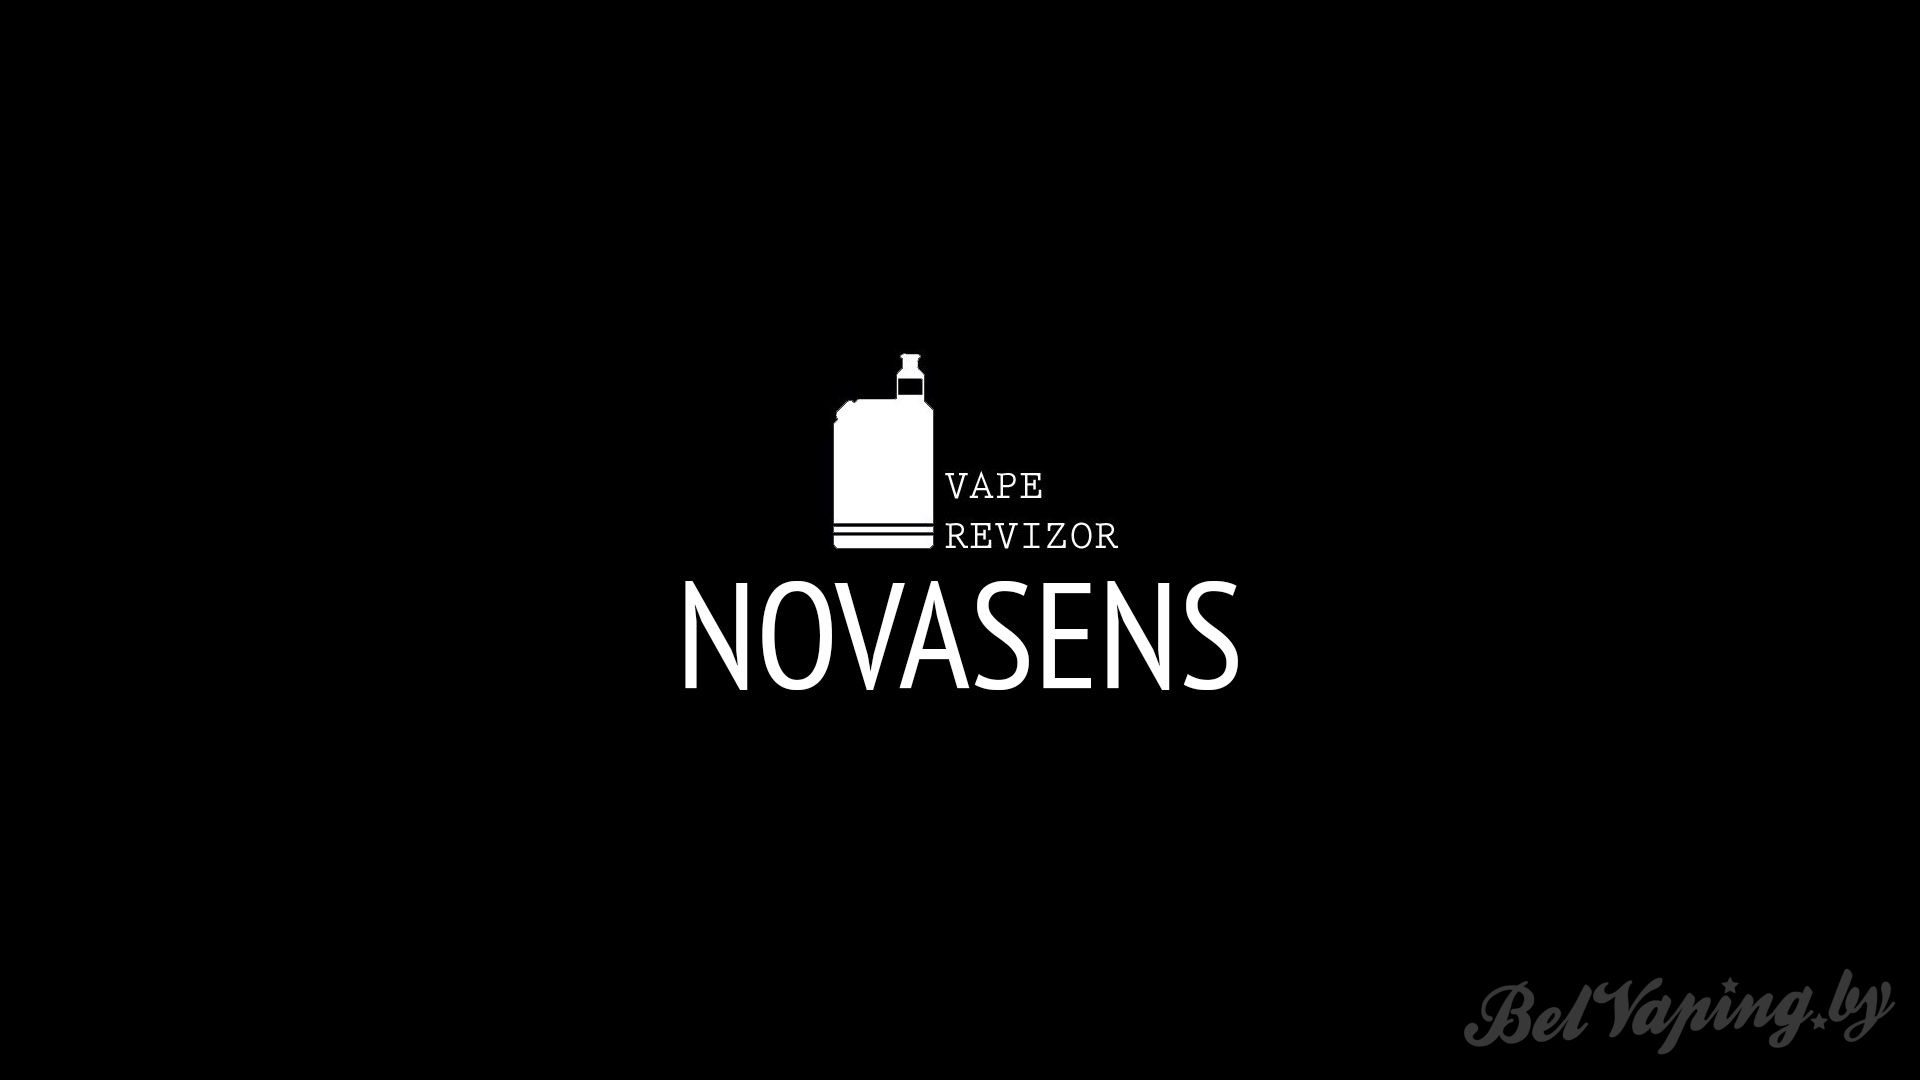 Vape Revizor: NovaSens